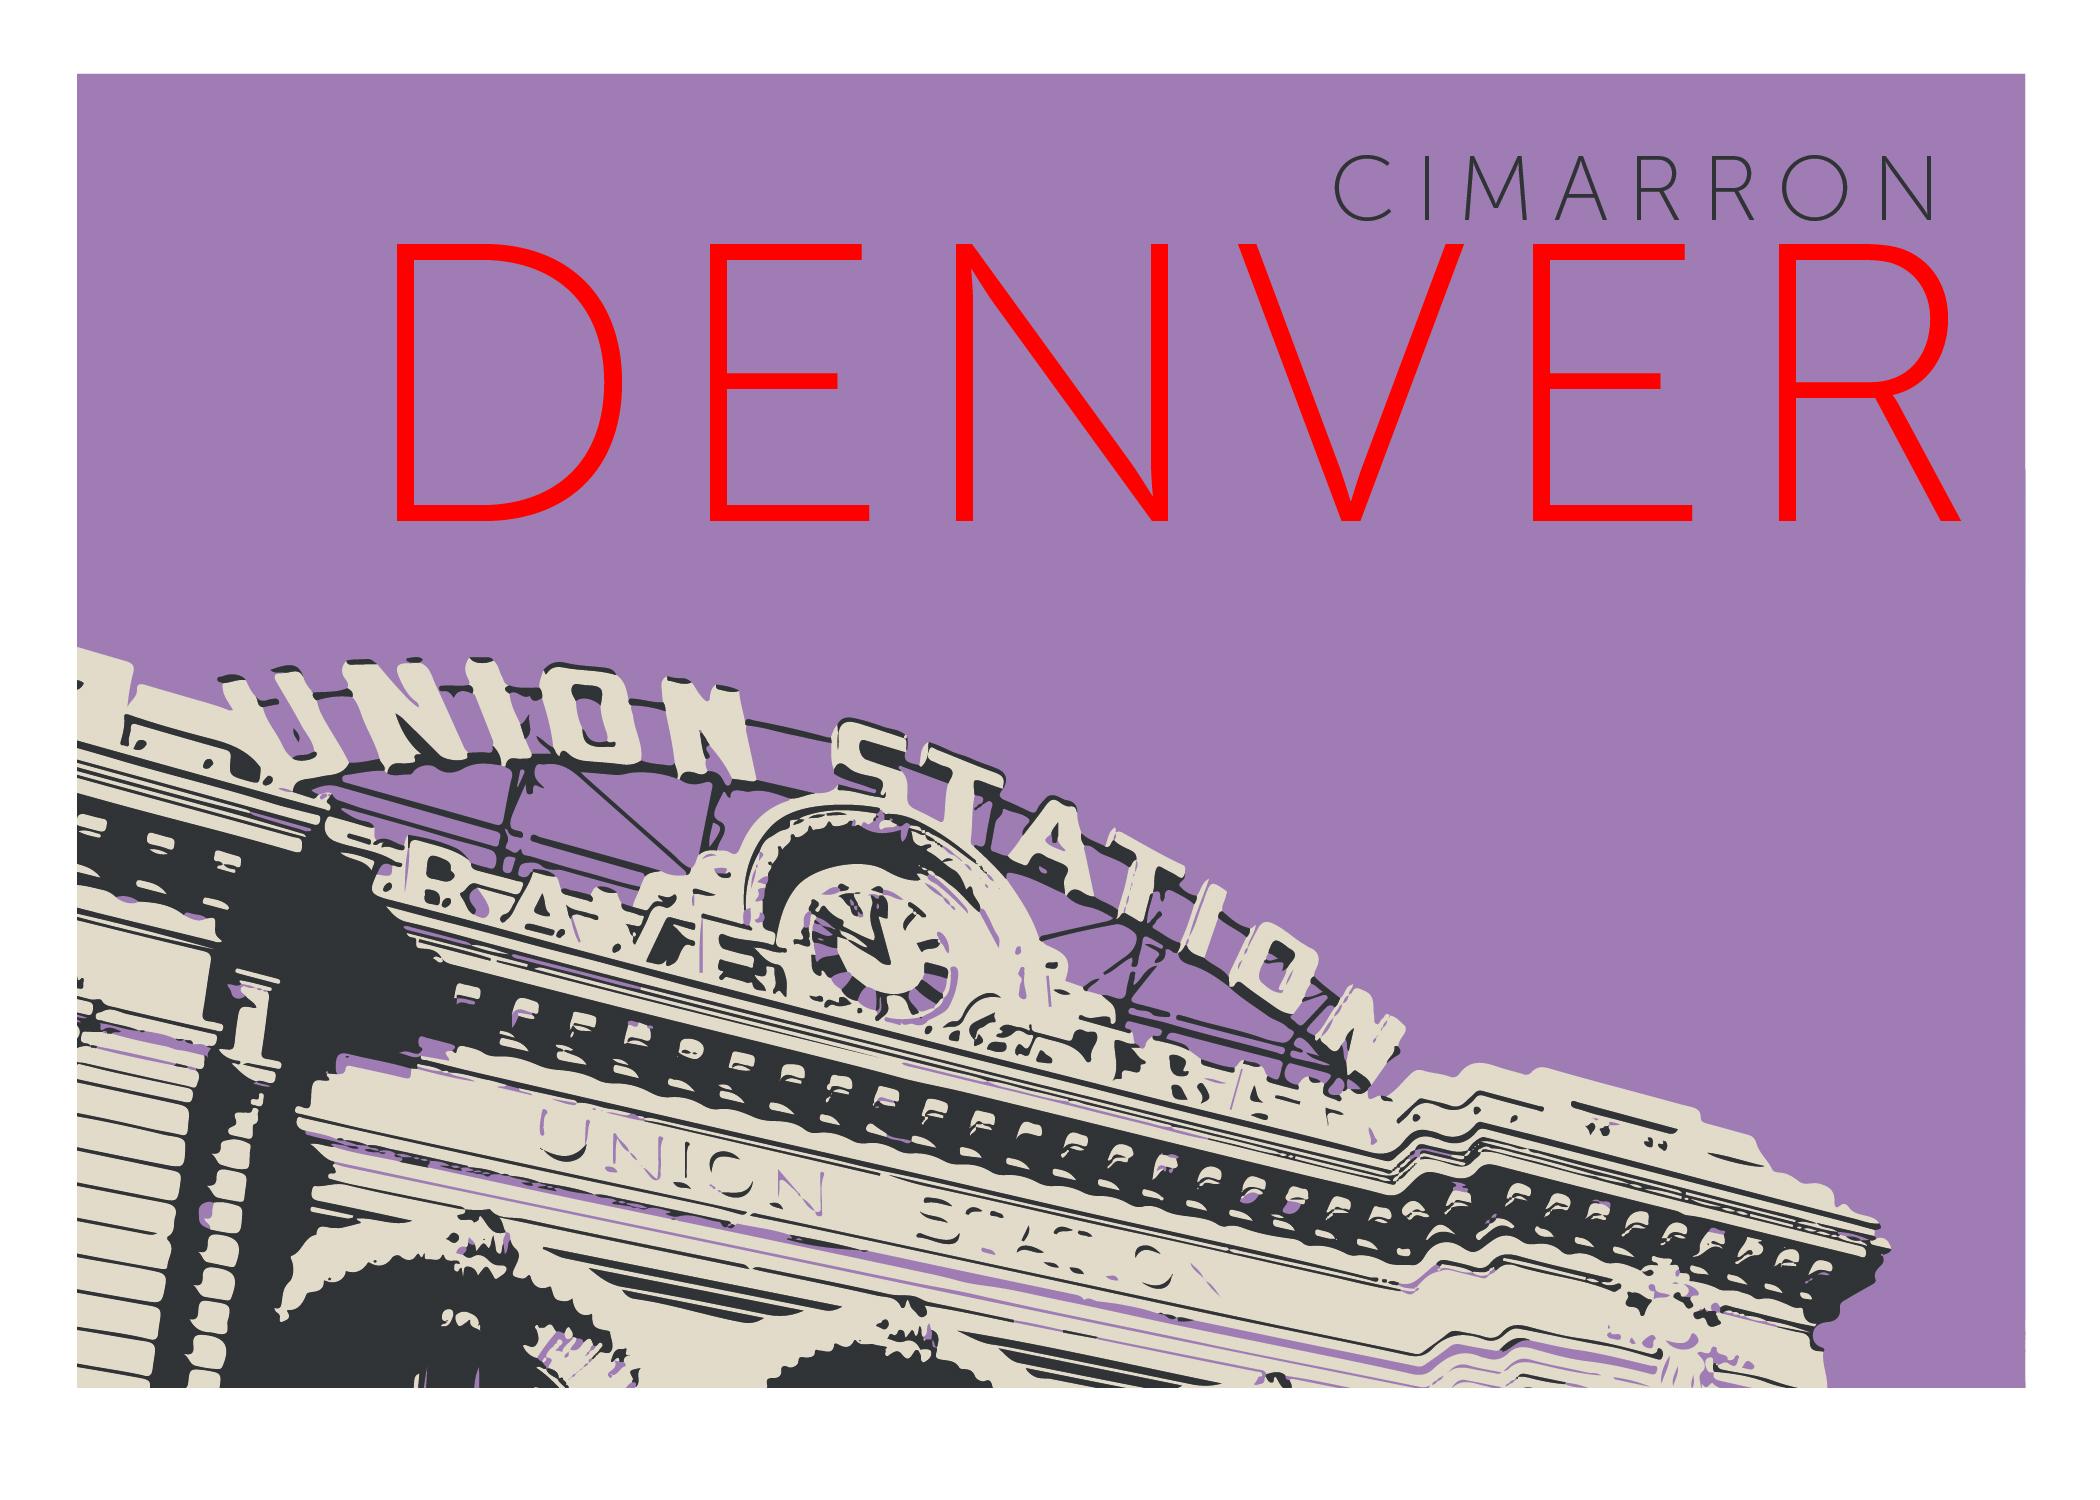 Cimarron Denver